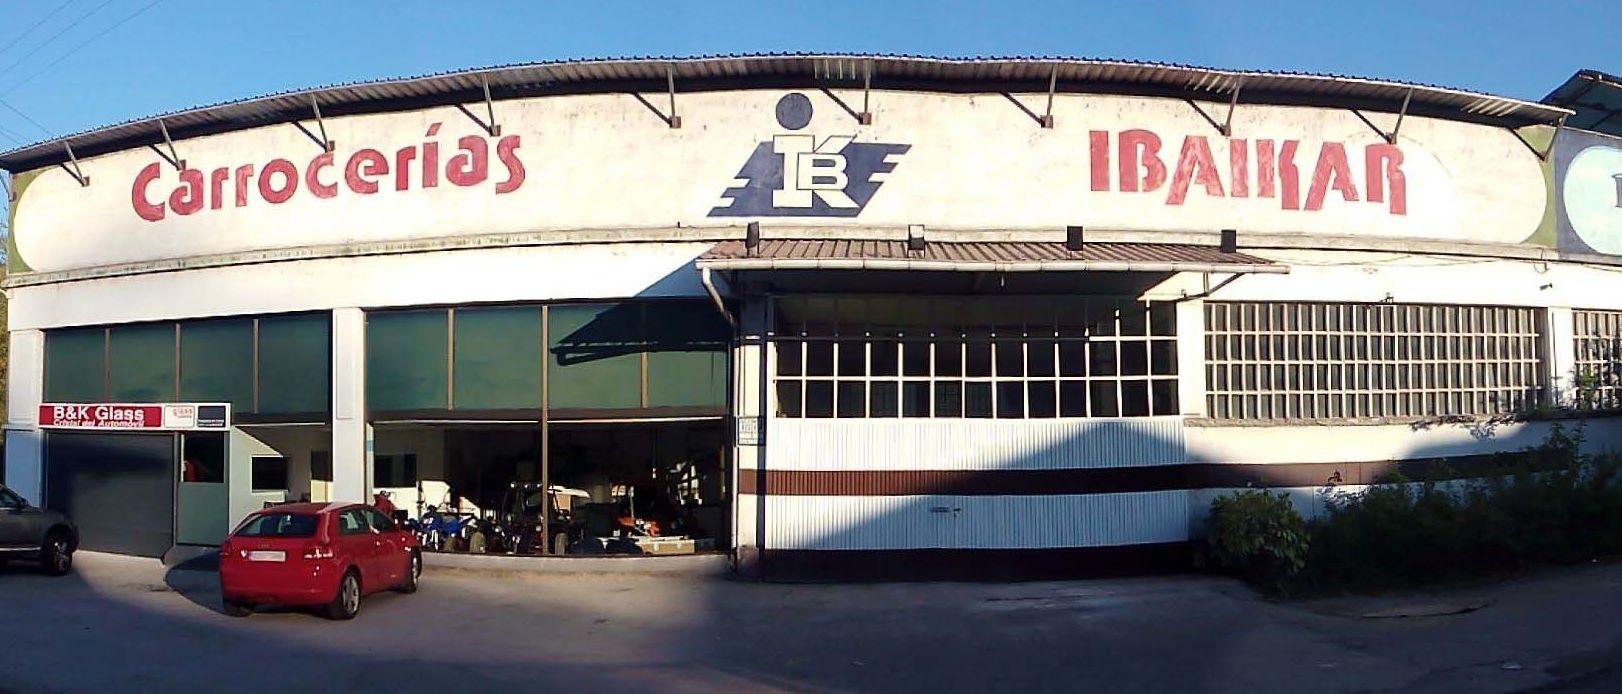 Taller de reparación de carrocerías de vehículos en Amorebieta-Etxano